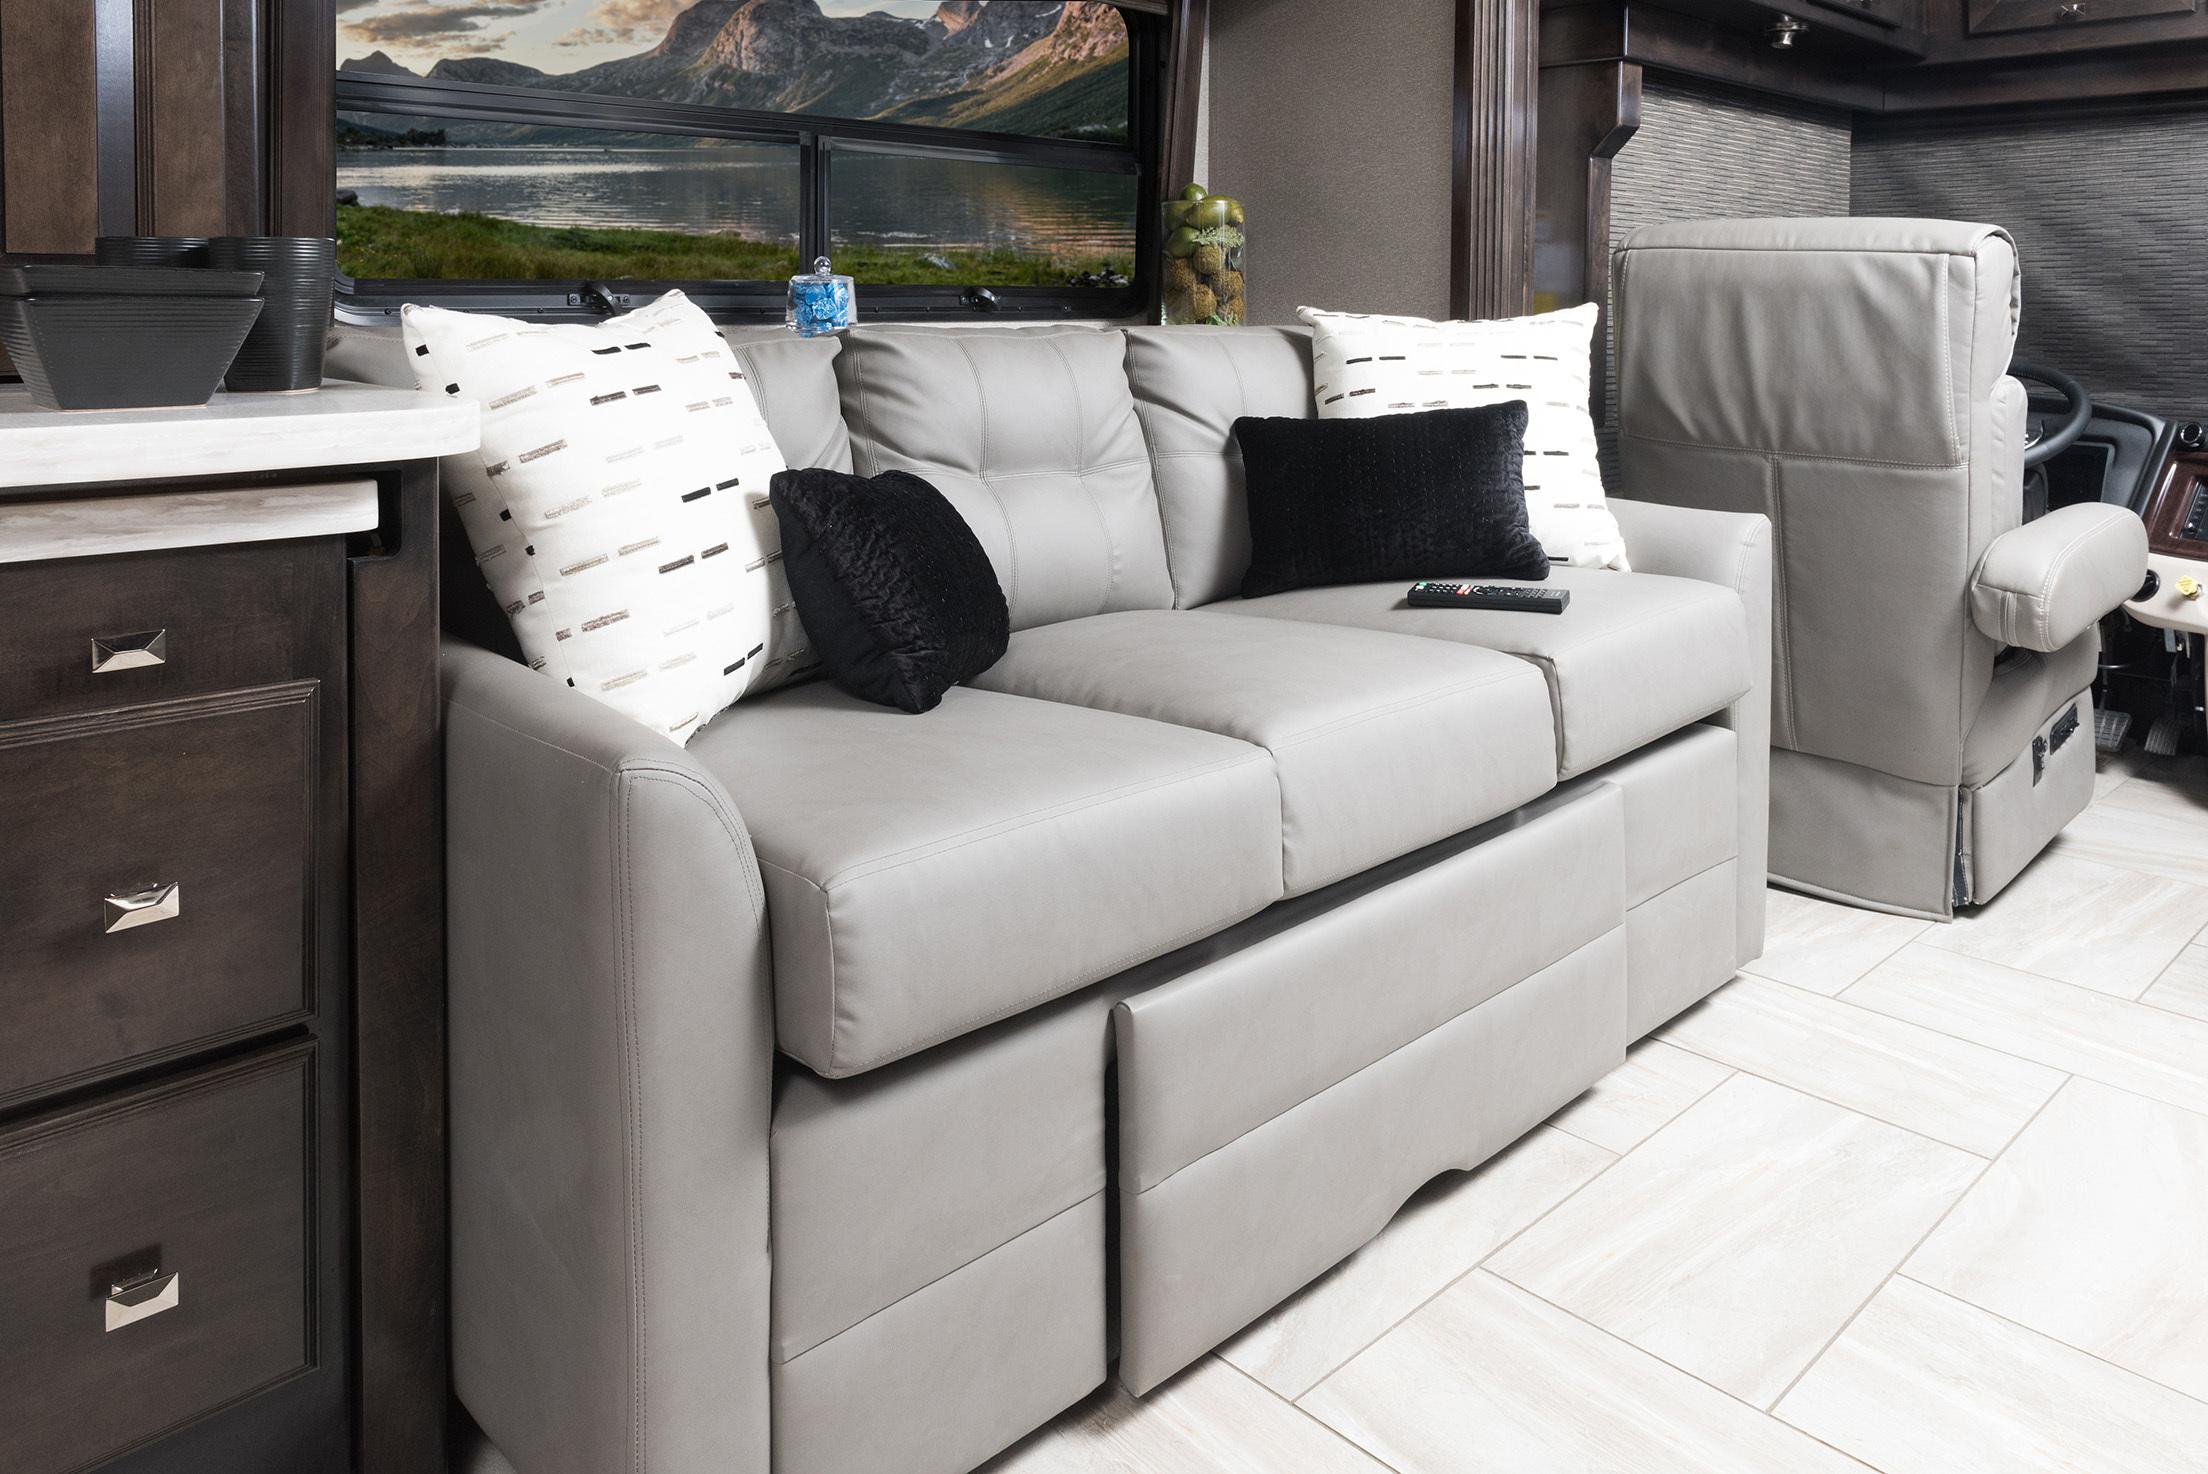 3 sofa 42 V REV Silverston Dorian1677 1